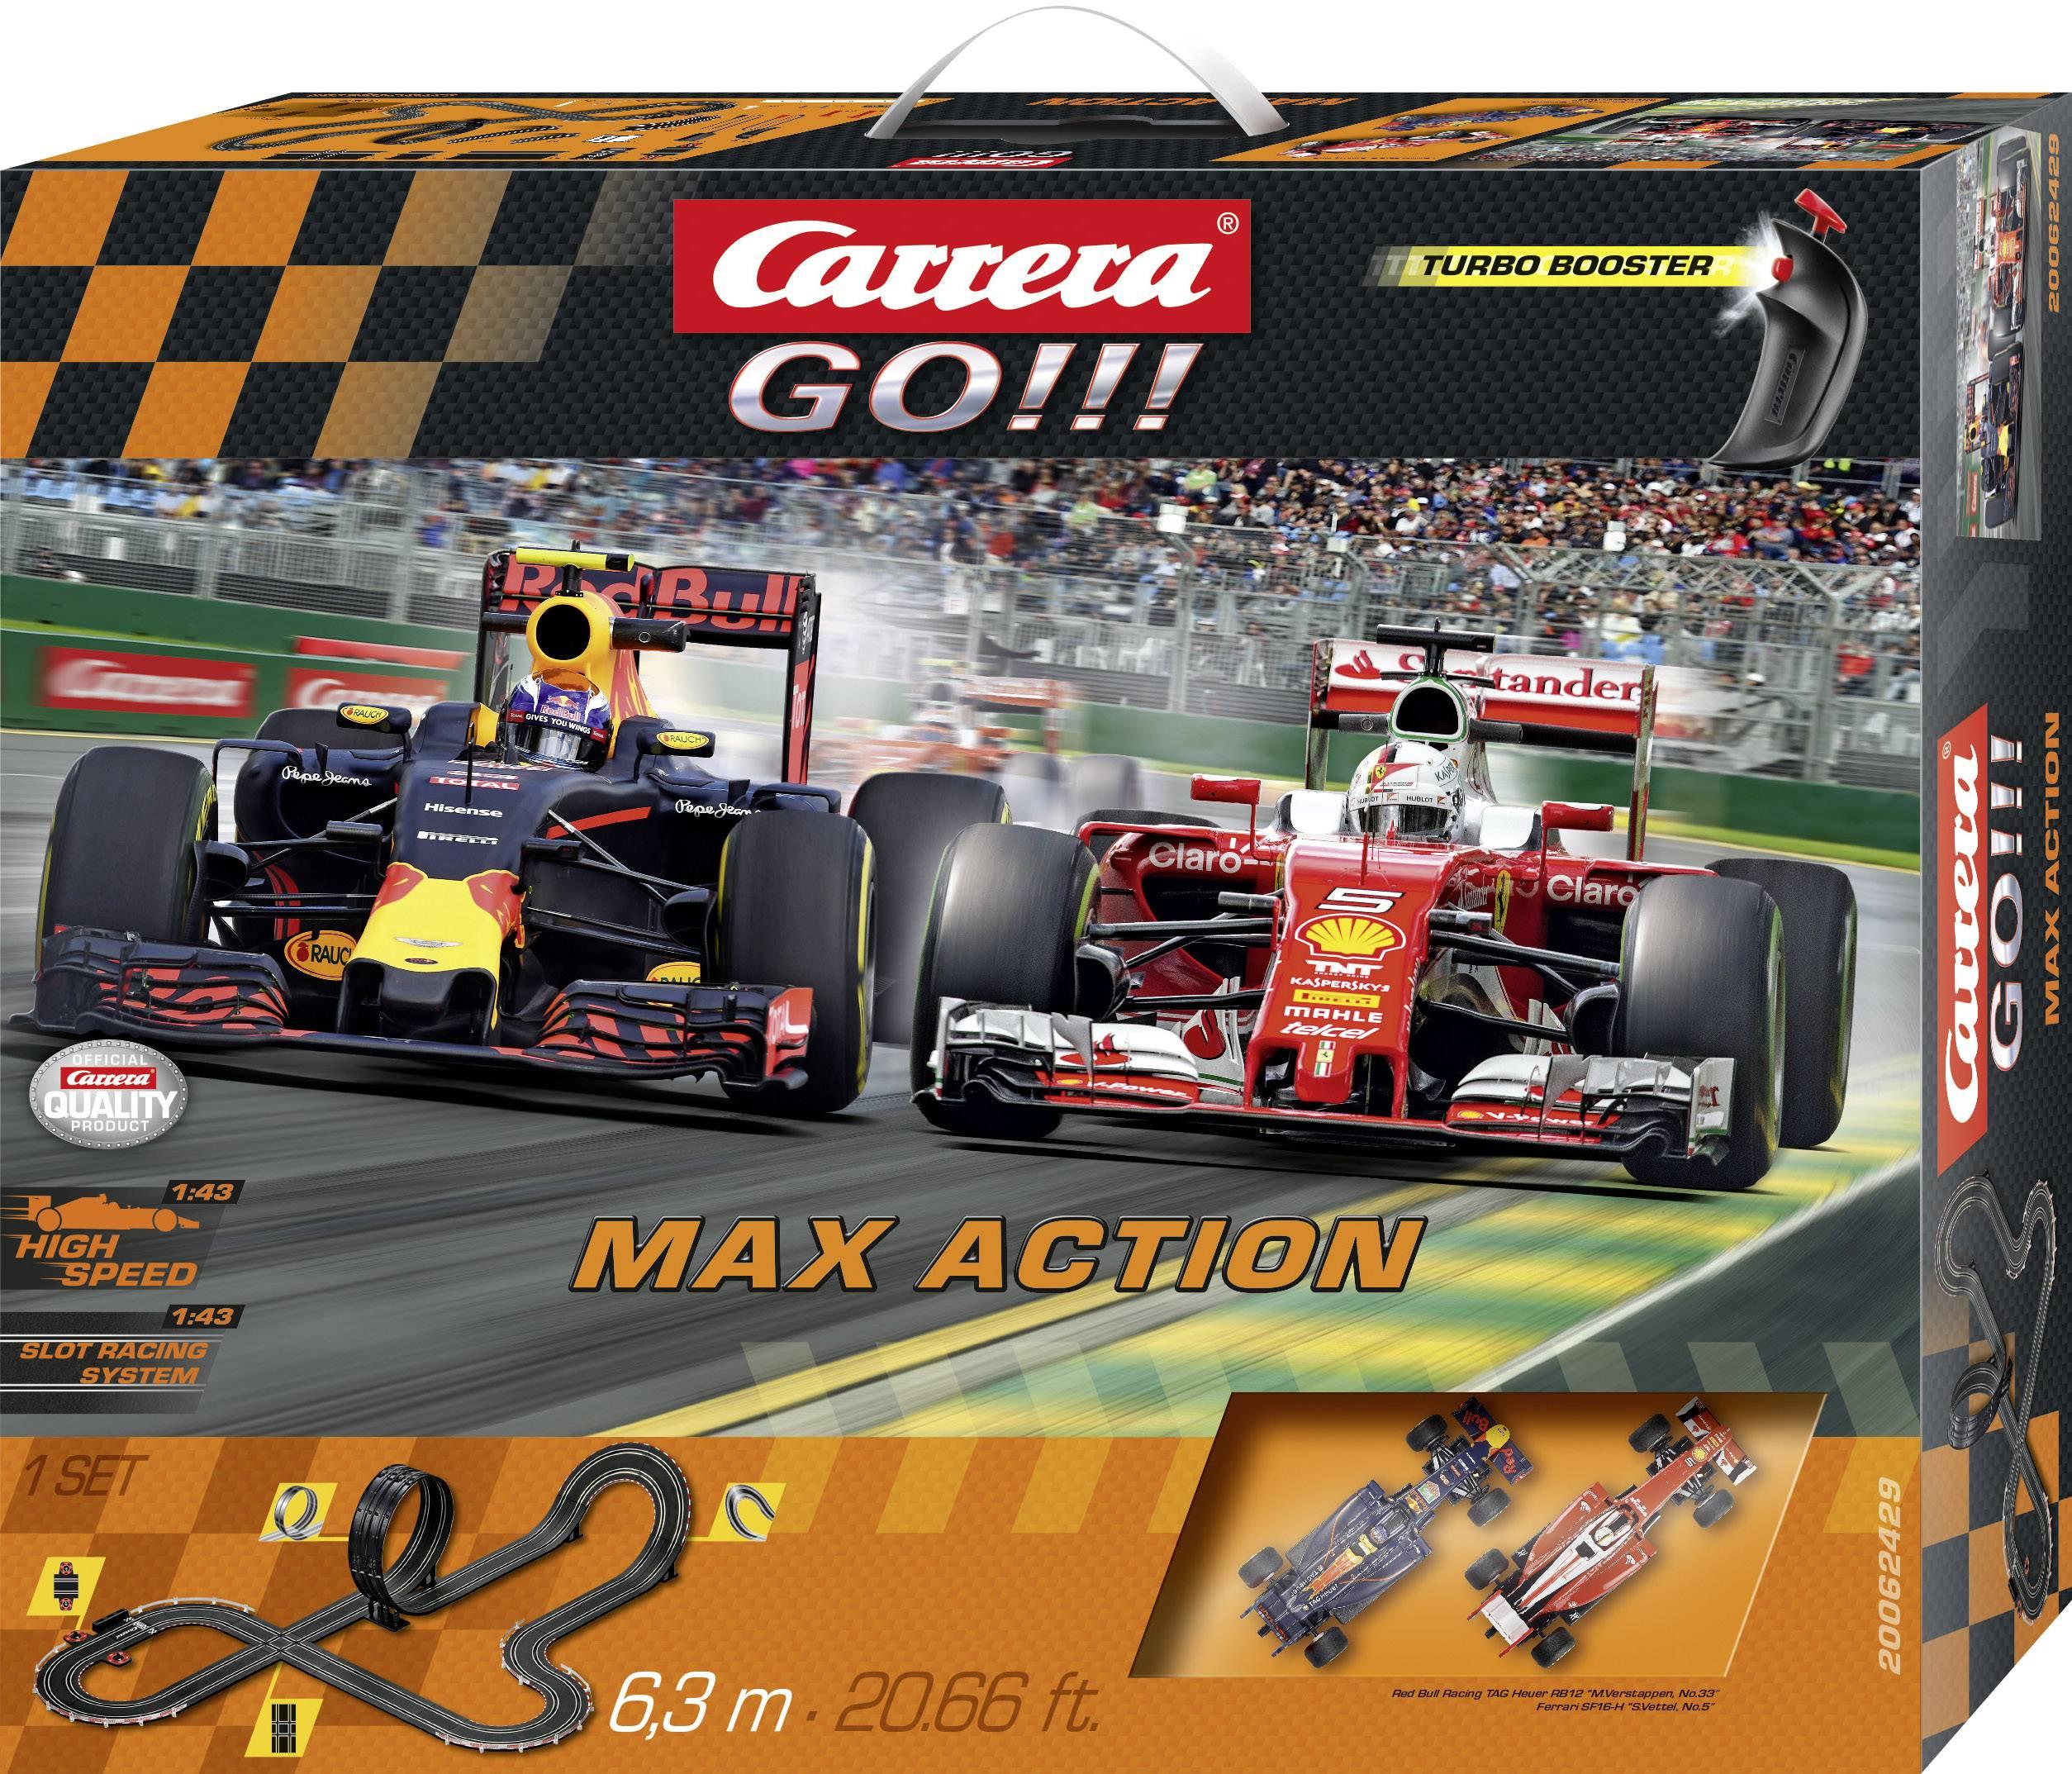 Autodráha, štartovacia sada Carrera Max Action 20062429, druh autodráhy GO!!!